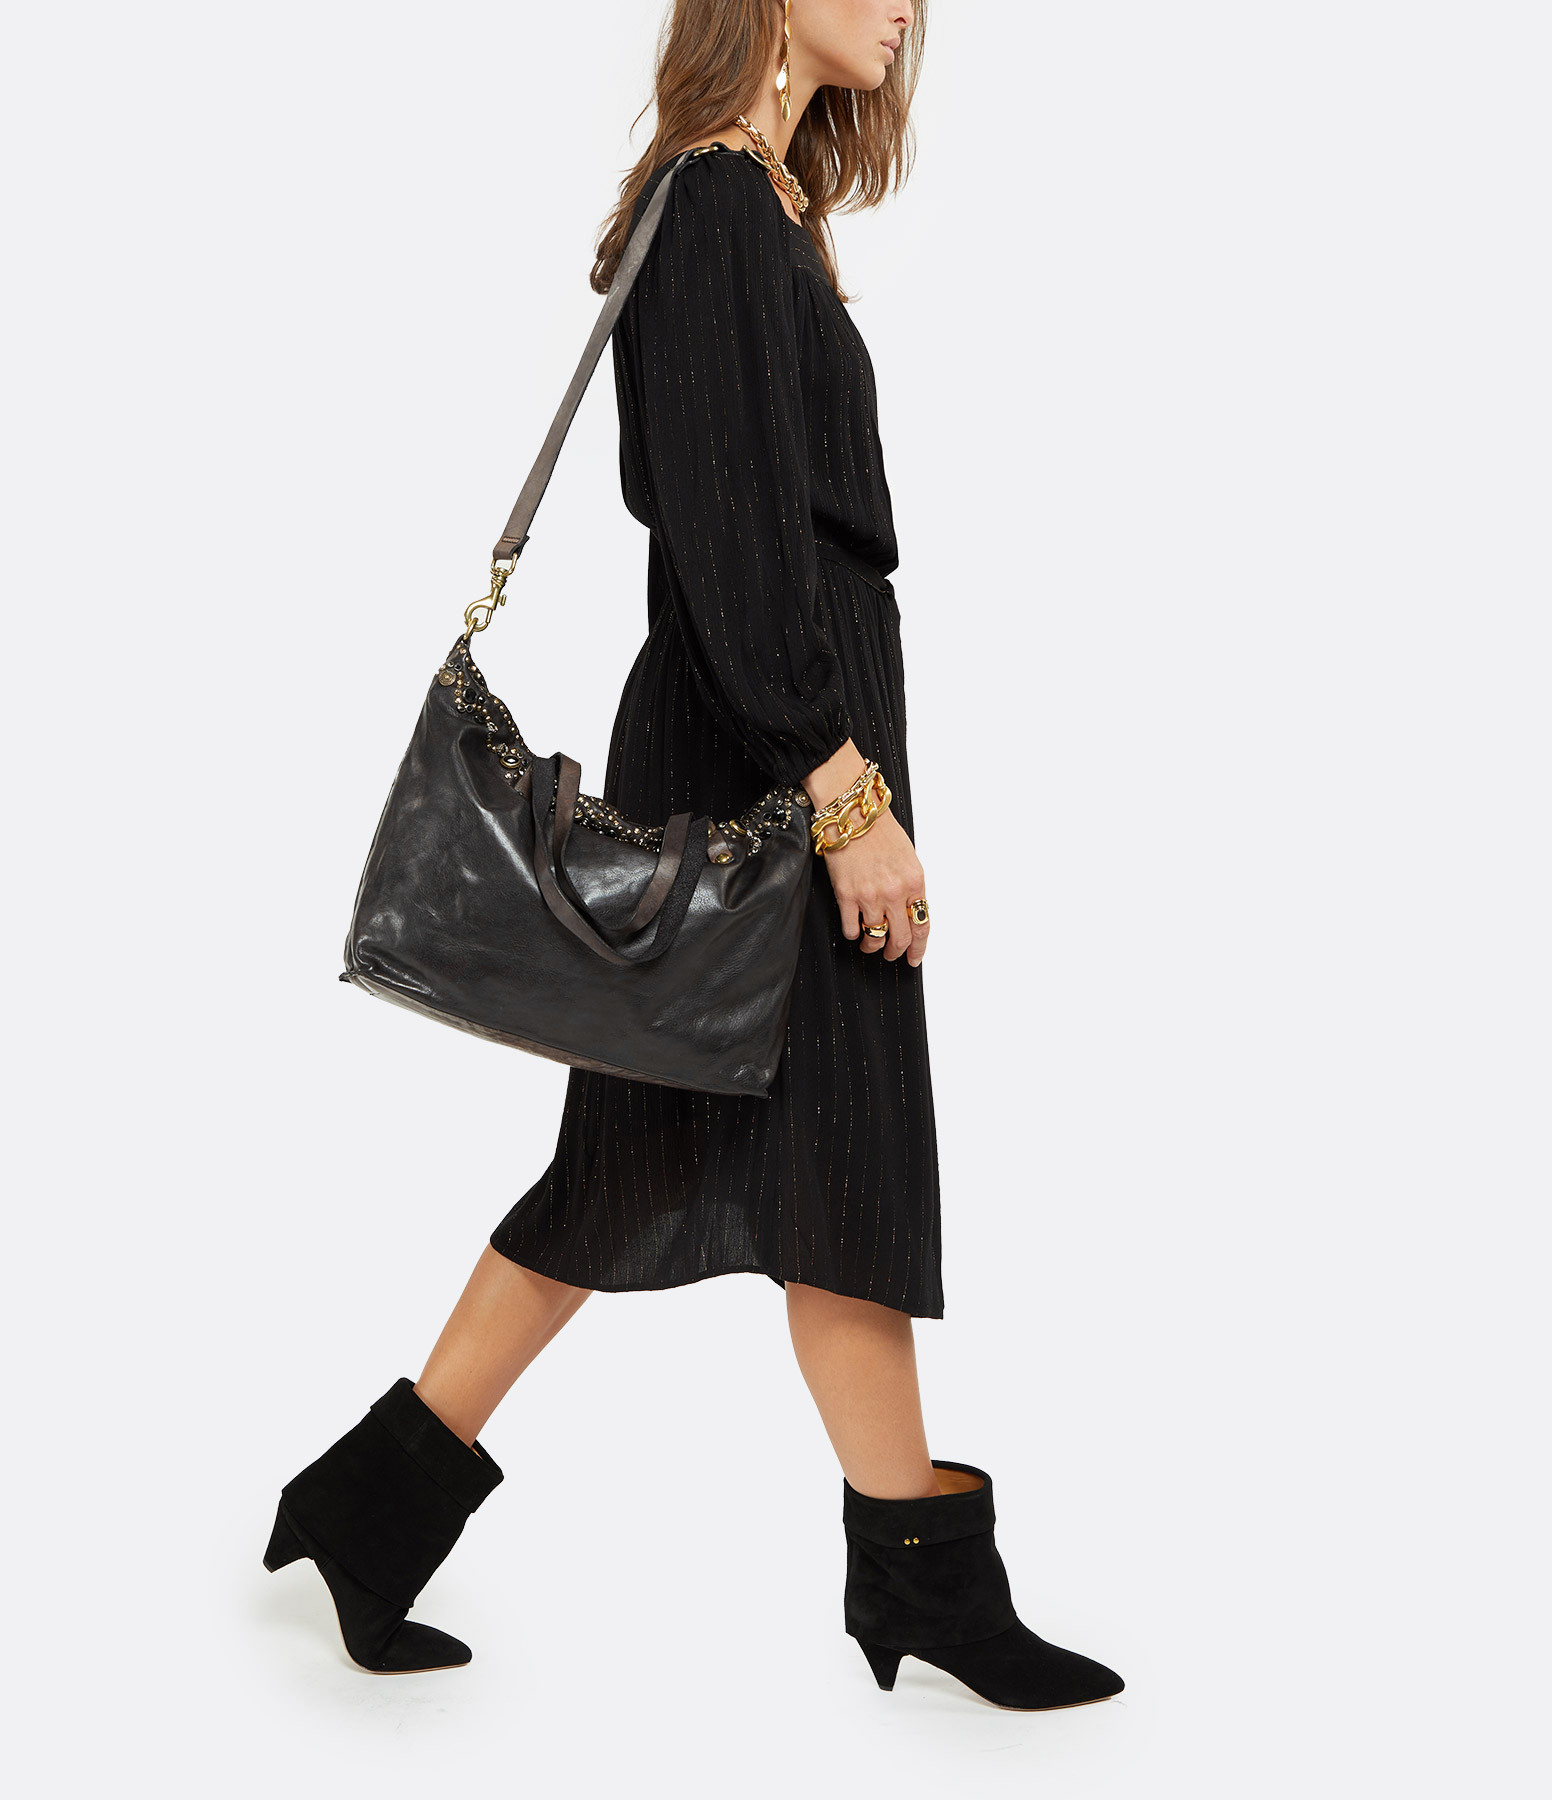 CAMPOMAGGI - Sac Shopping Large Cuir Vachette Clous Gris